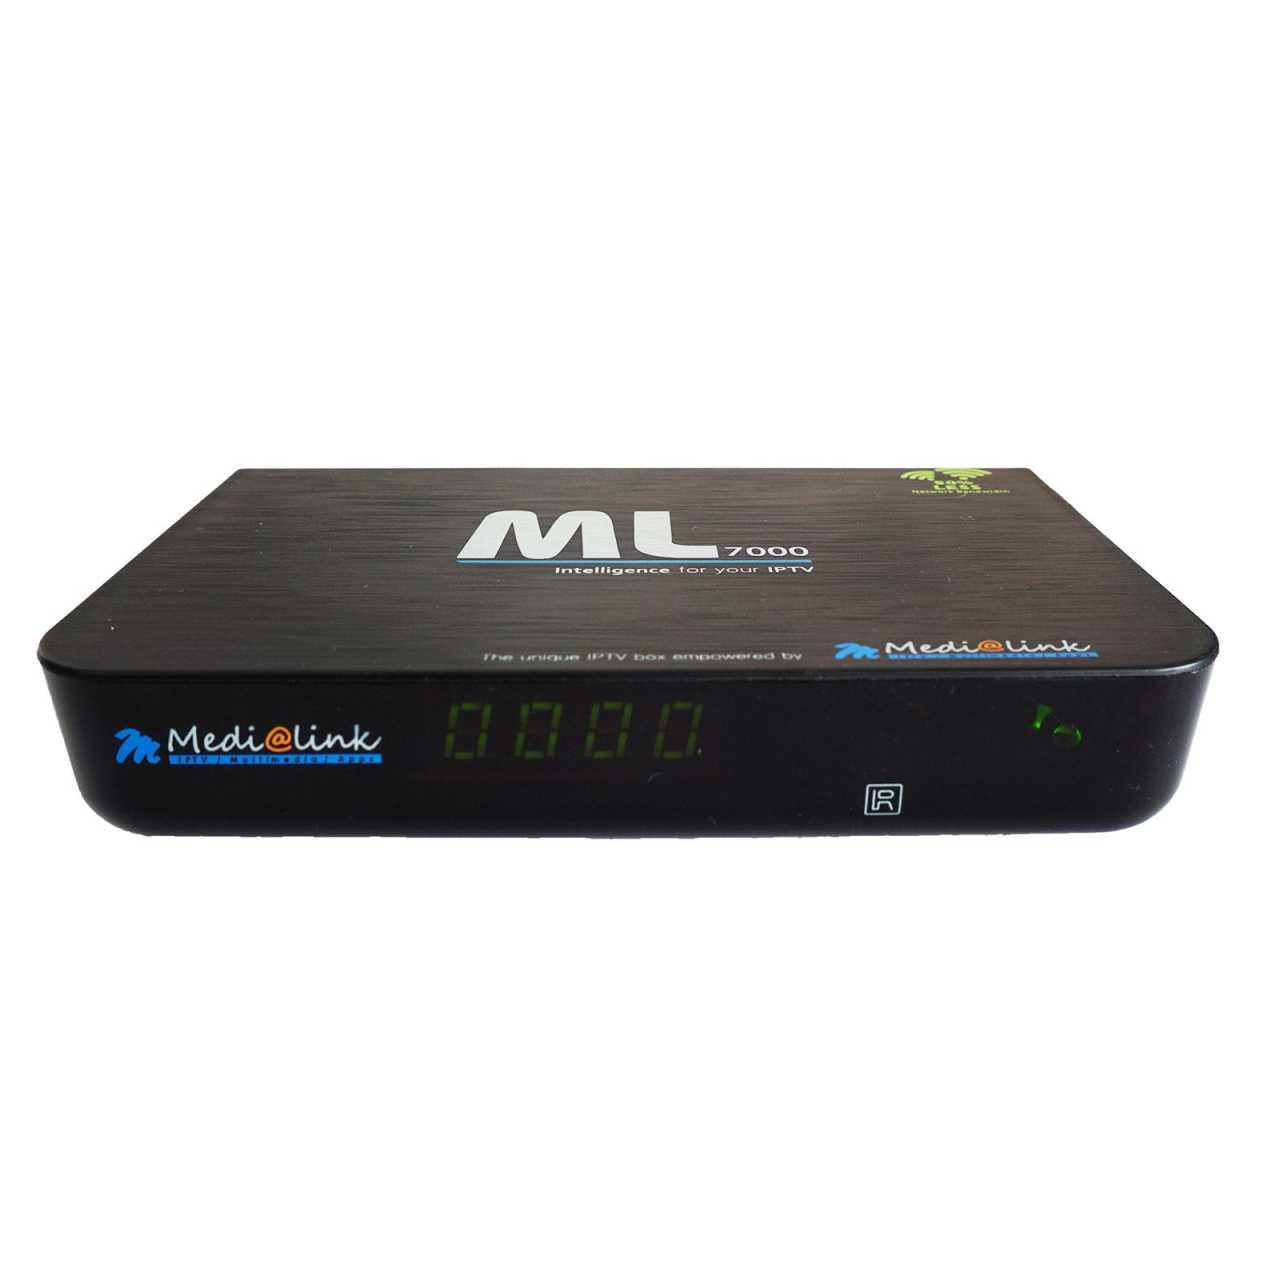 Medialink Smart Home ML7000 Full HD Internet TV IP Receiver RECMED030